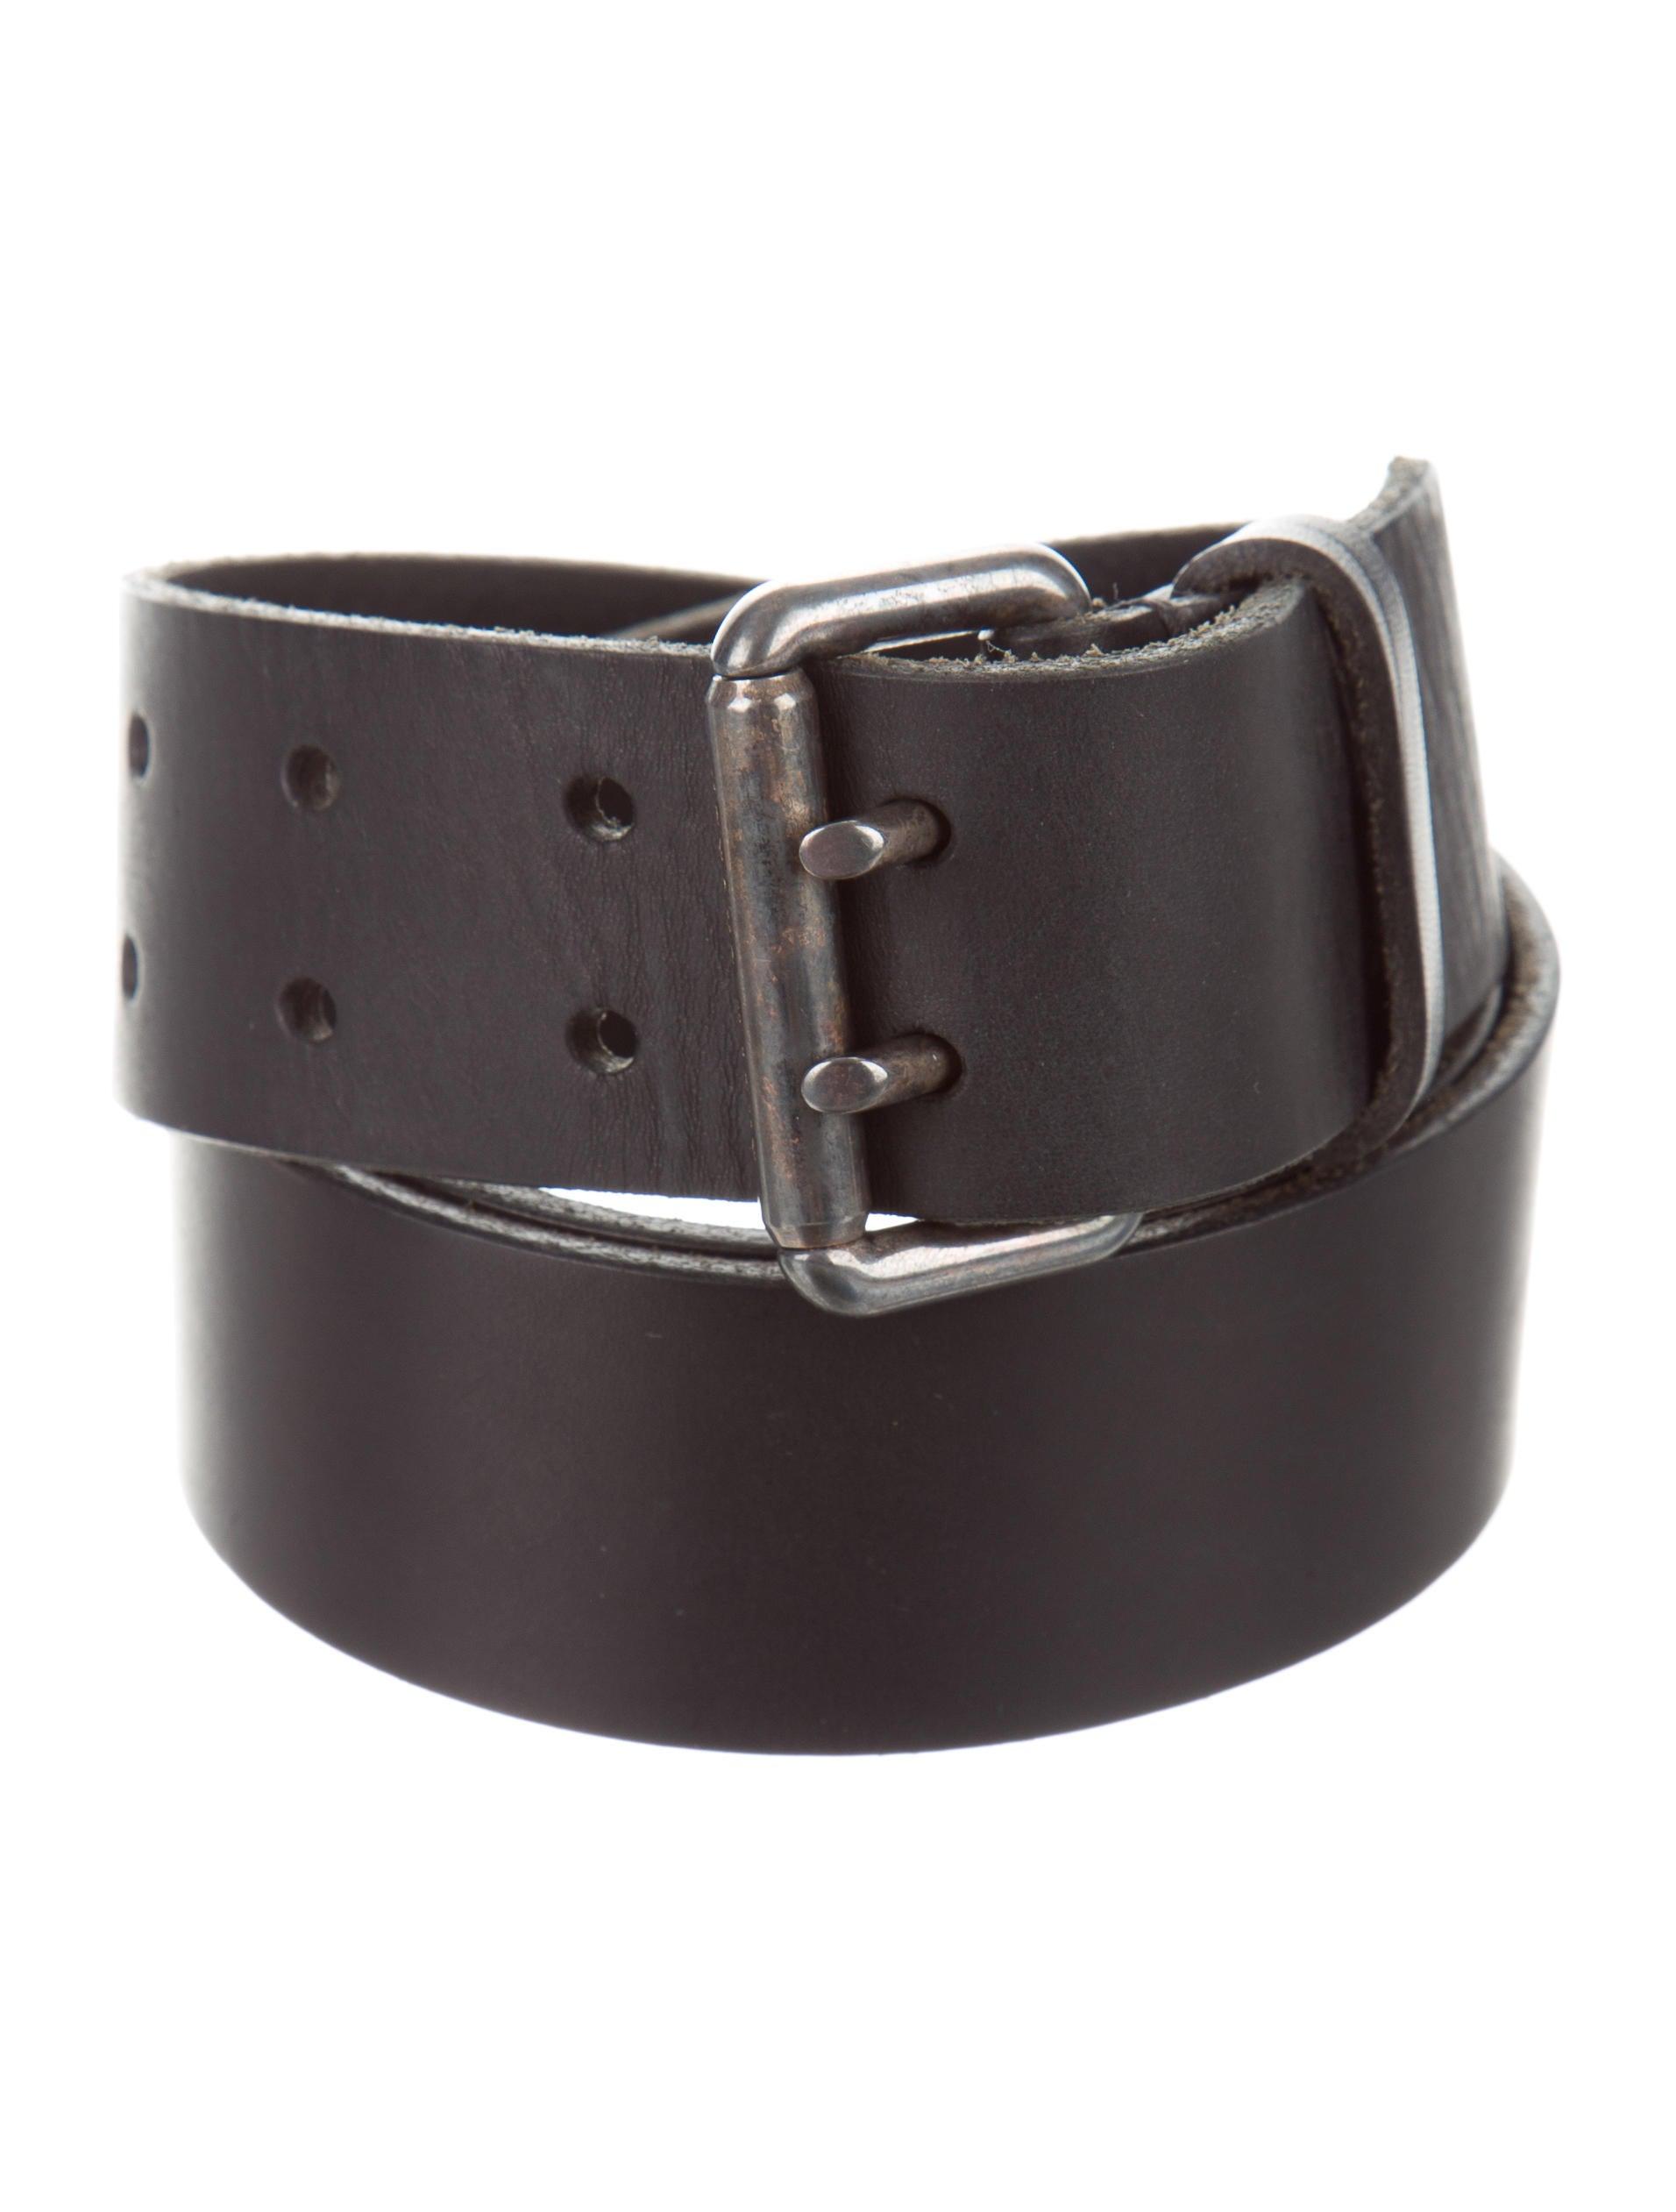 ralph lauren leather waist belt accessories wyg22382. Black Bedroom Furniture Sets. Home Design Ideas